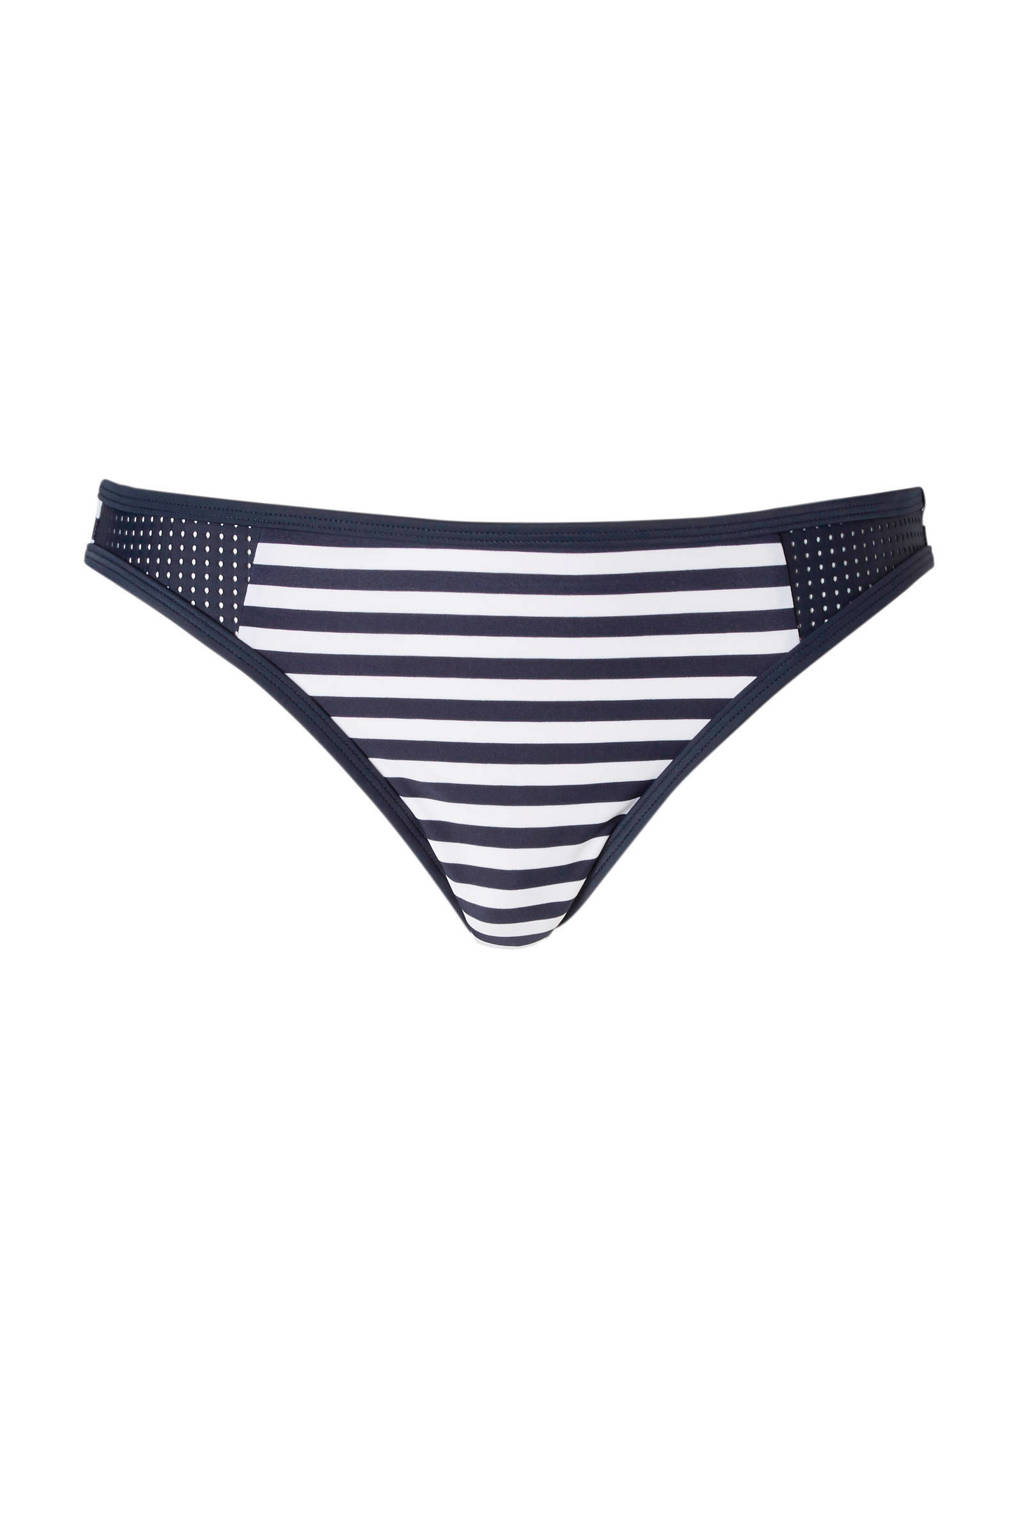 ESPRIT Women Beach gestreept bikinibroekje donkerblauw, Donkerblauw/wit